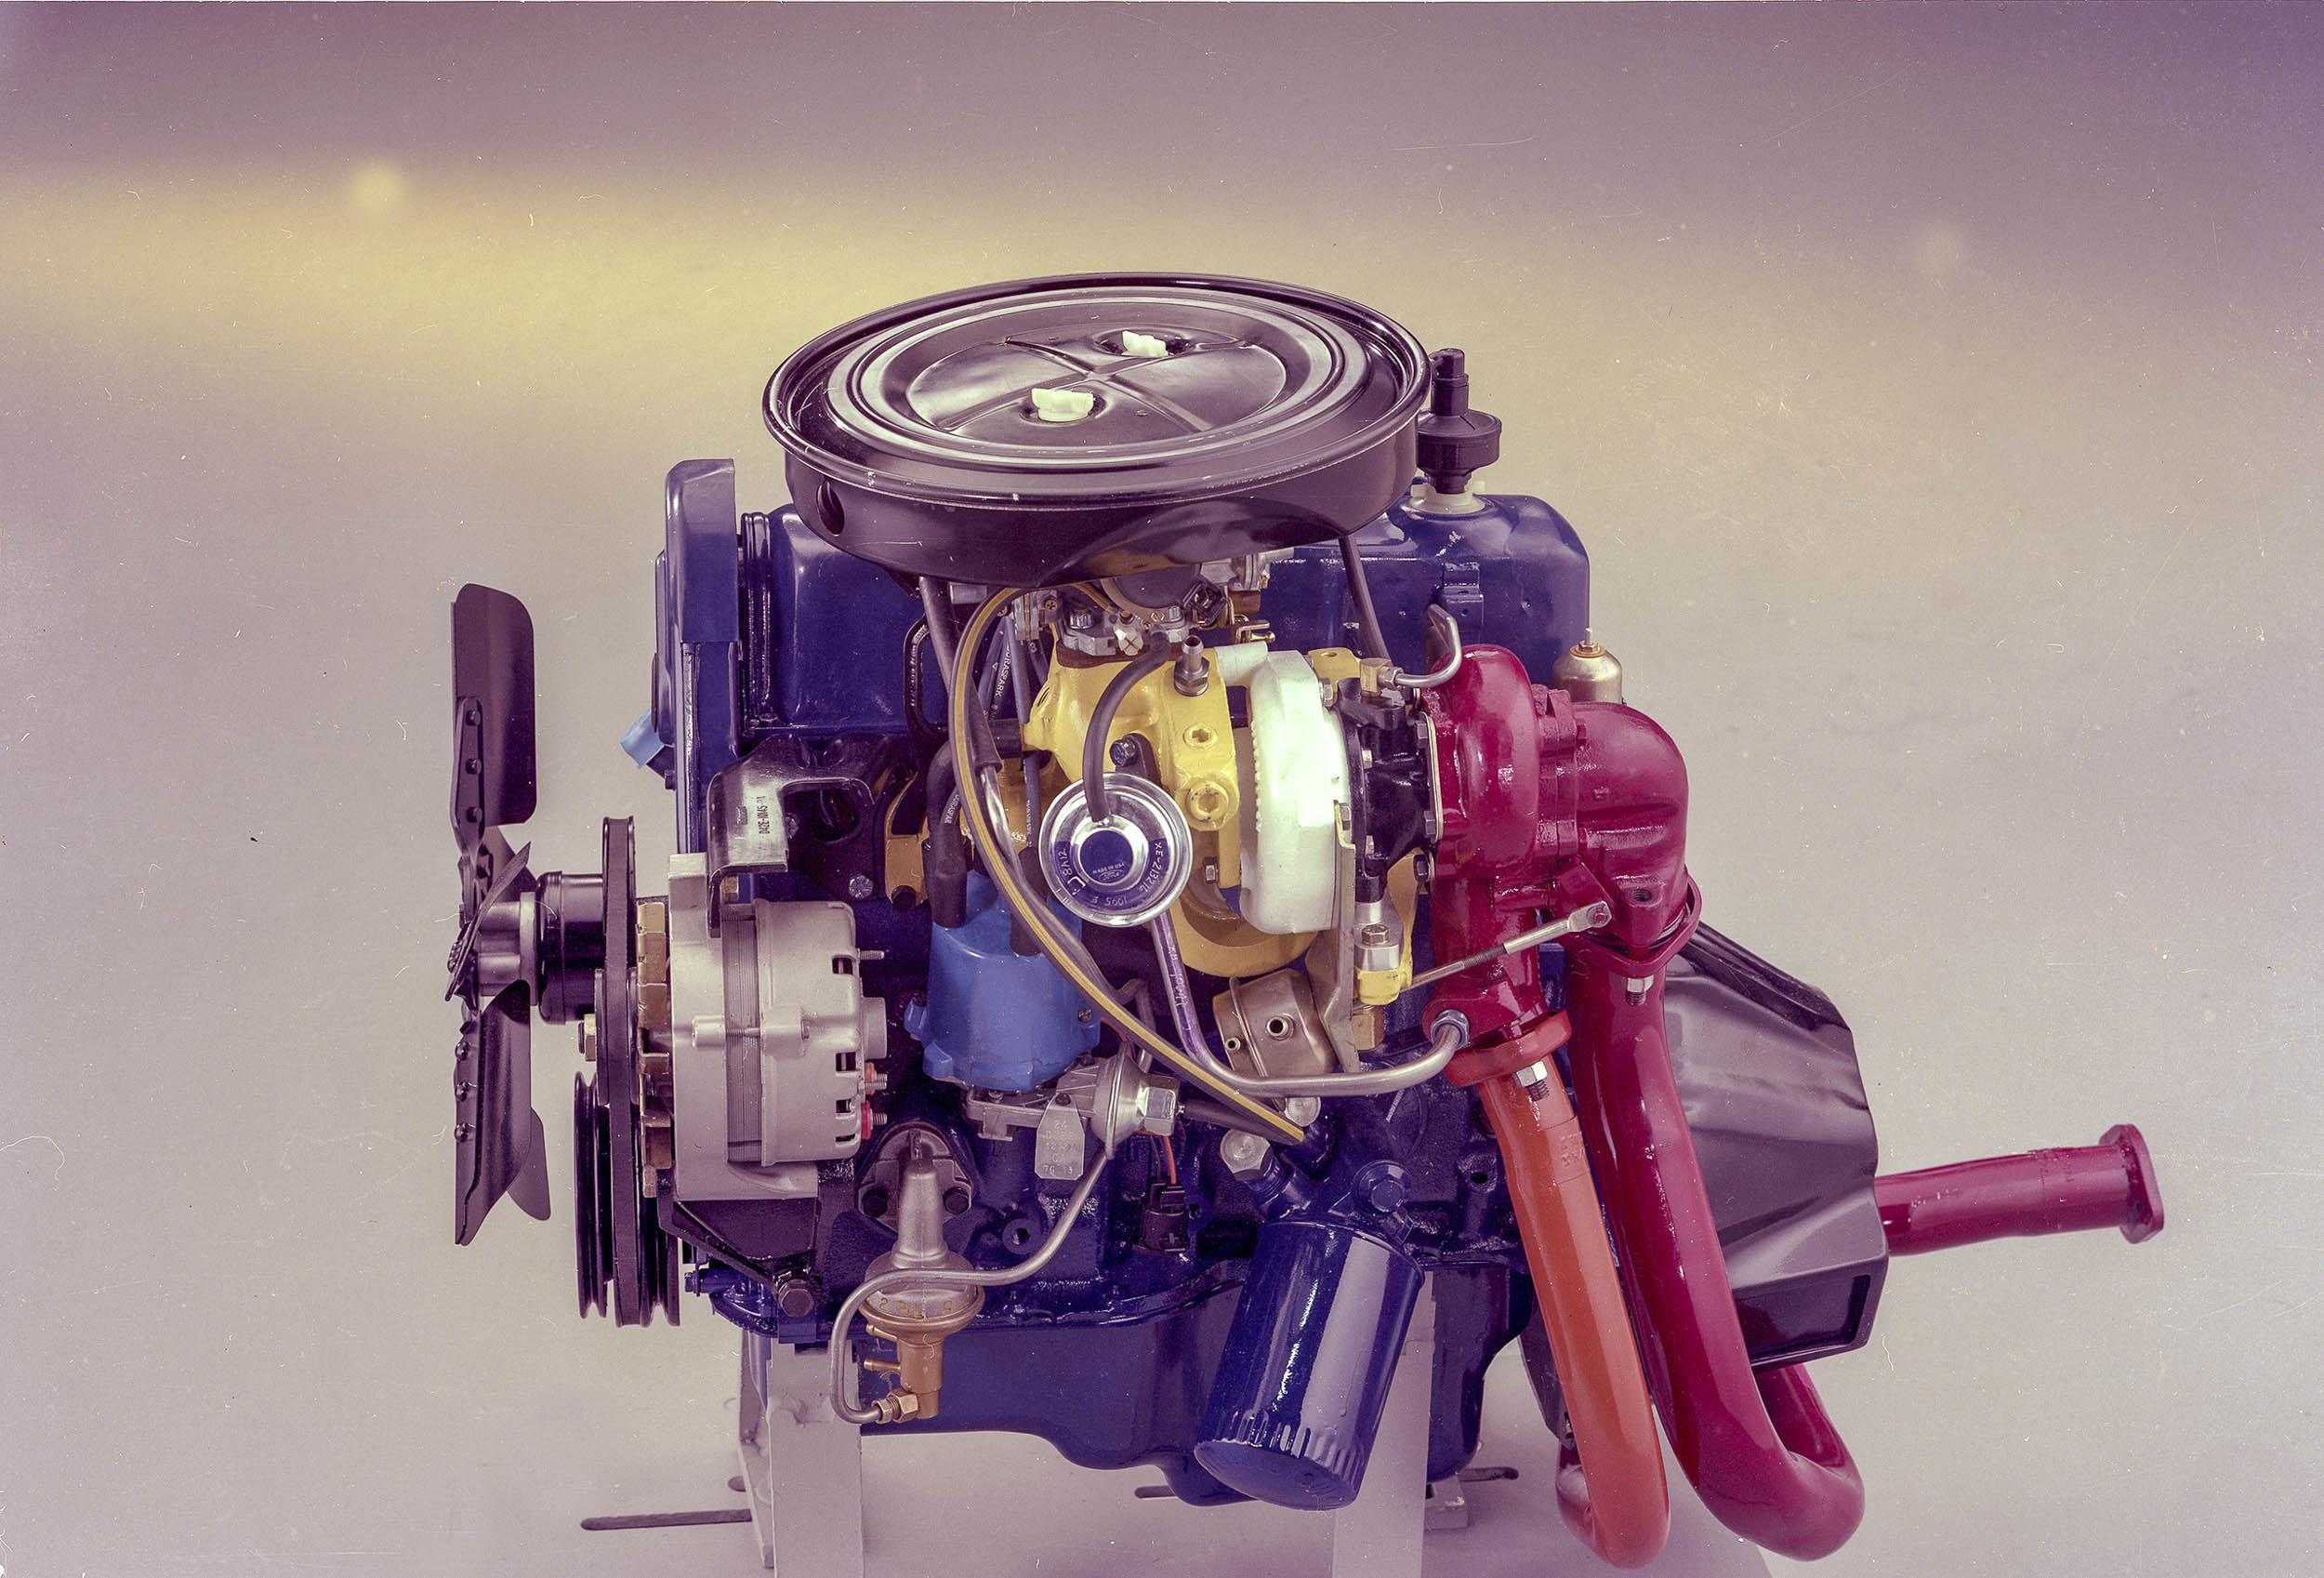 Turbo Mustang progenitor